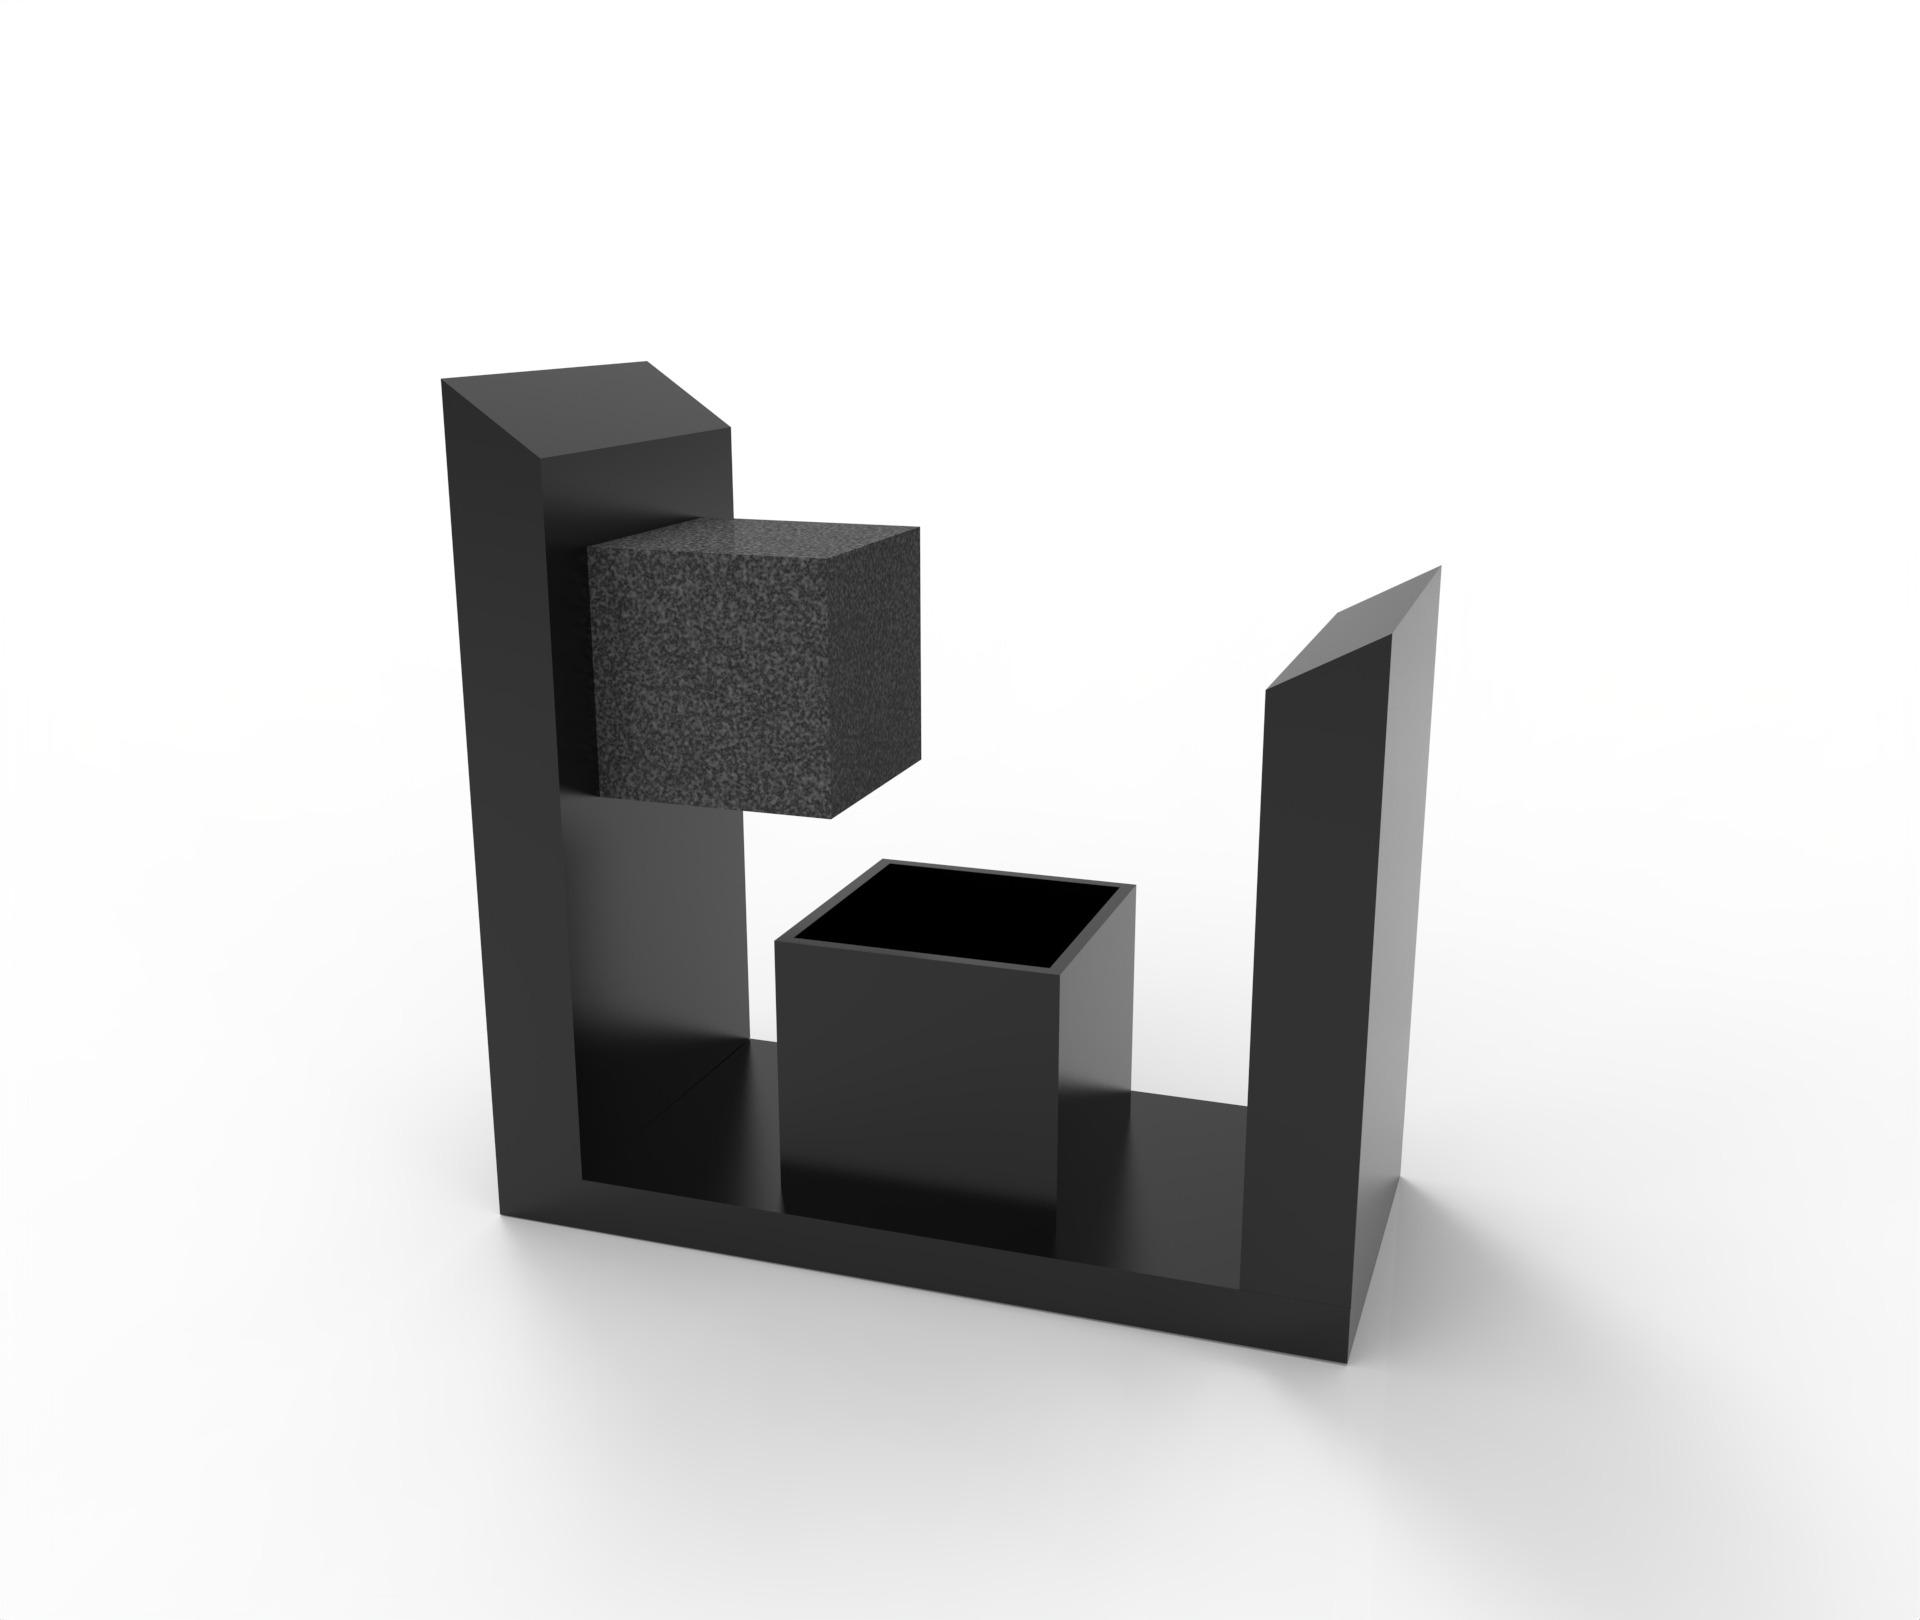 Digital Prototype 2